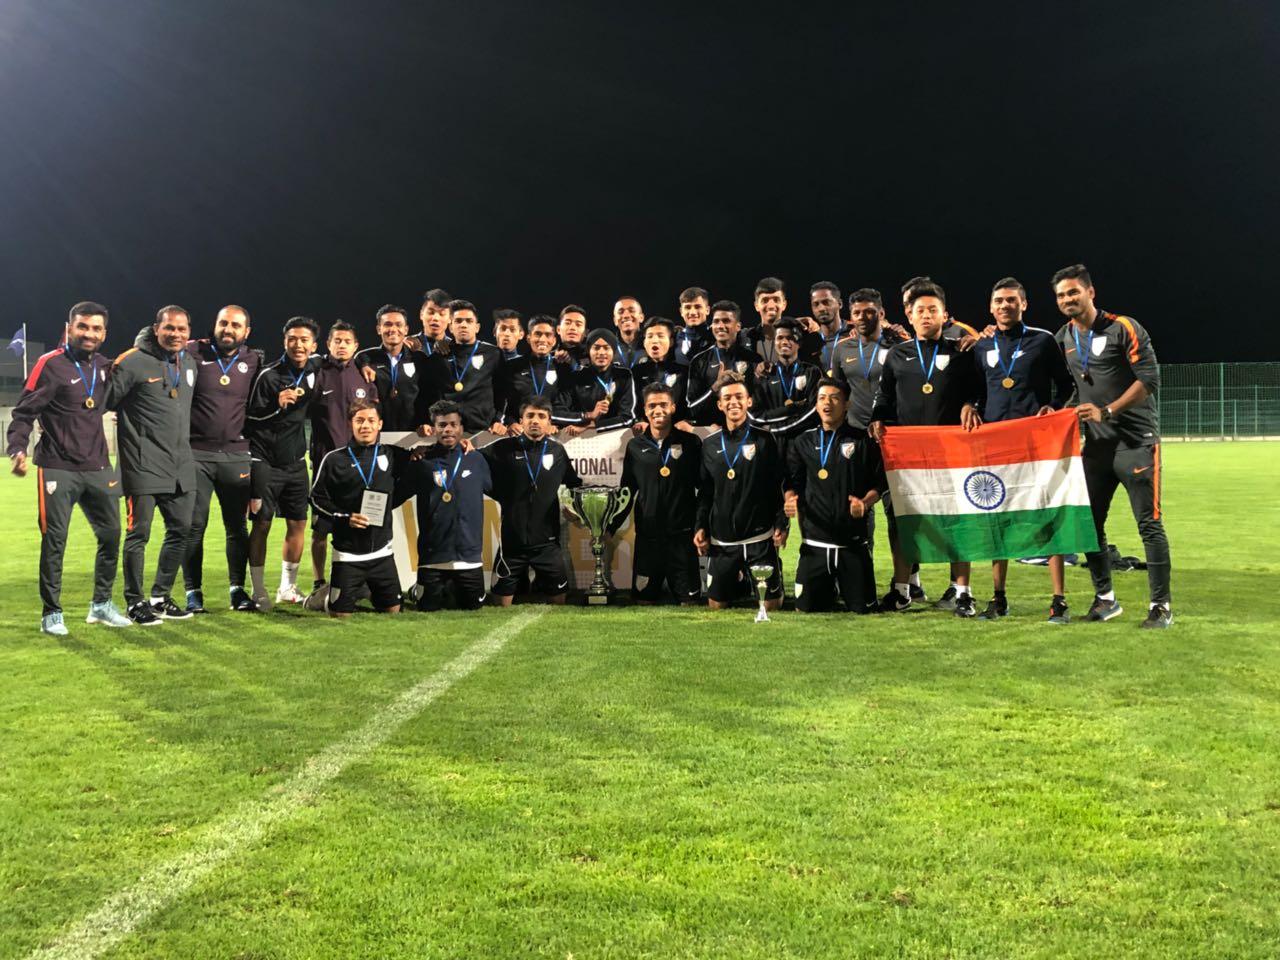 Afc championship 2018 date